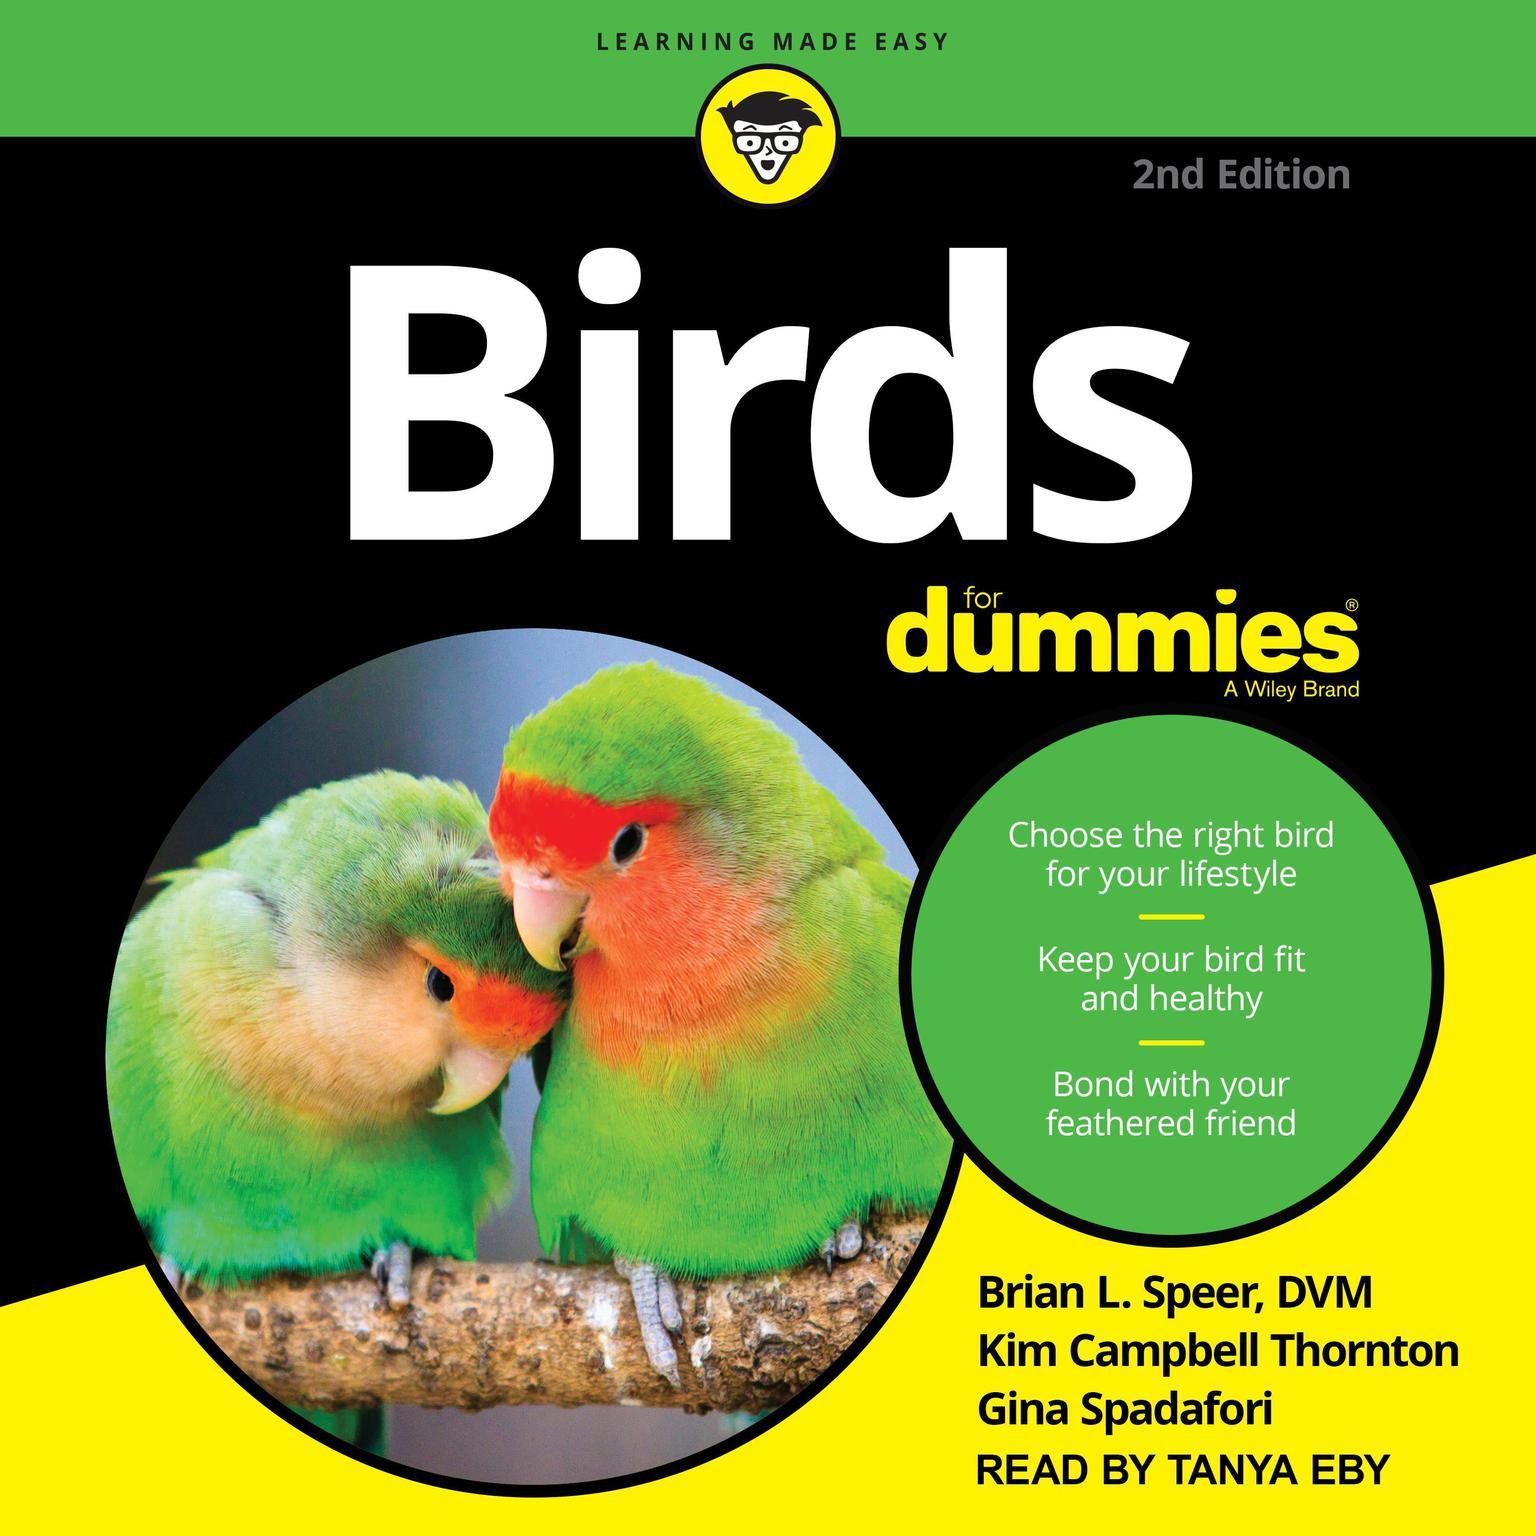 Birds for Dummies: 2nd edition Audiobook, by Gina Spadafori